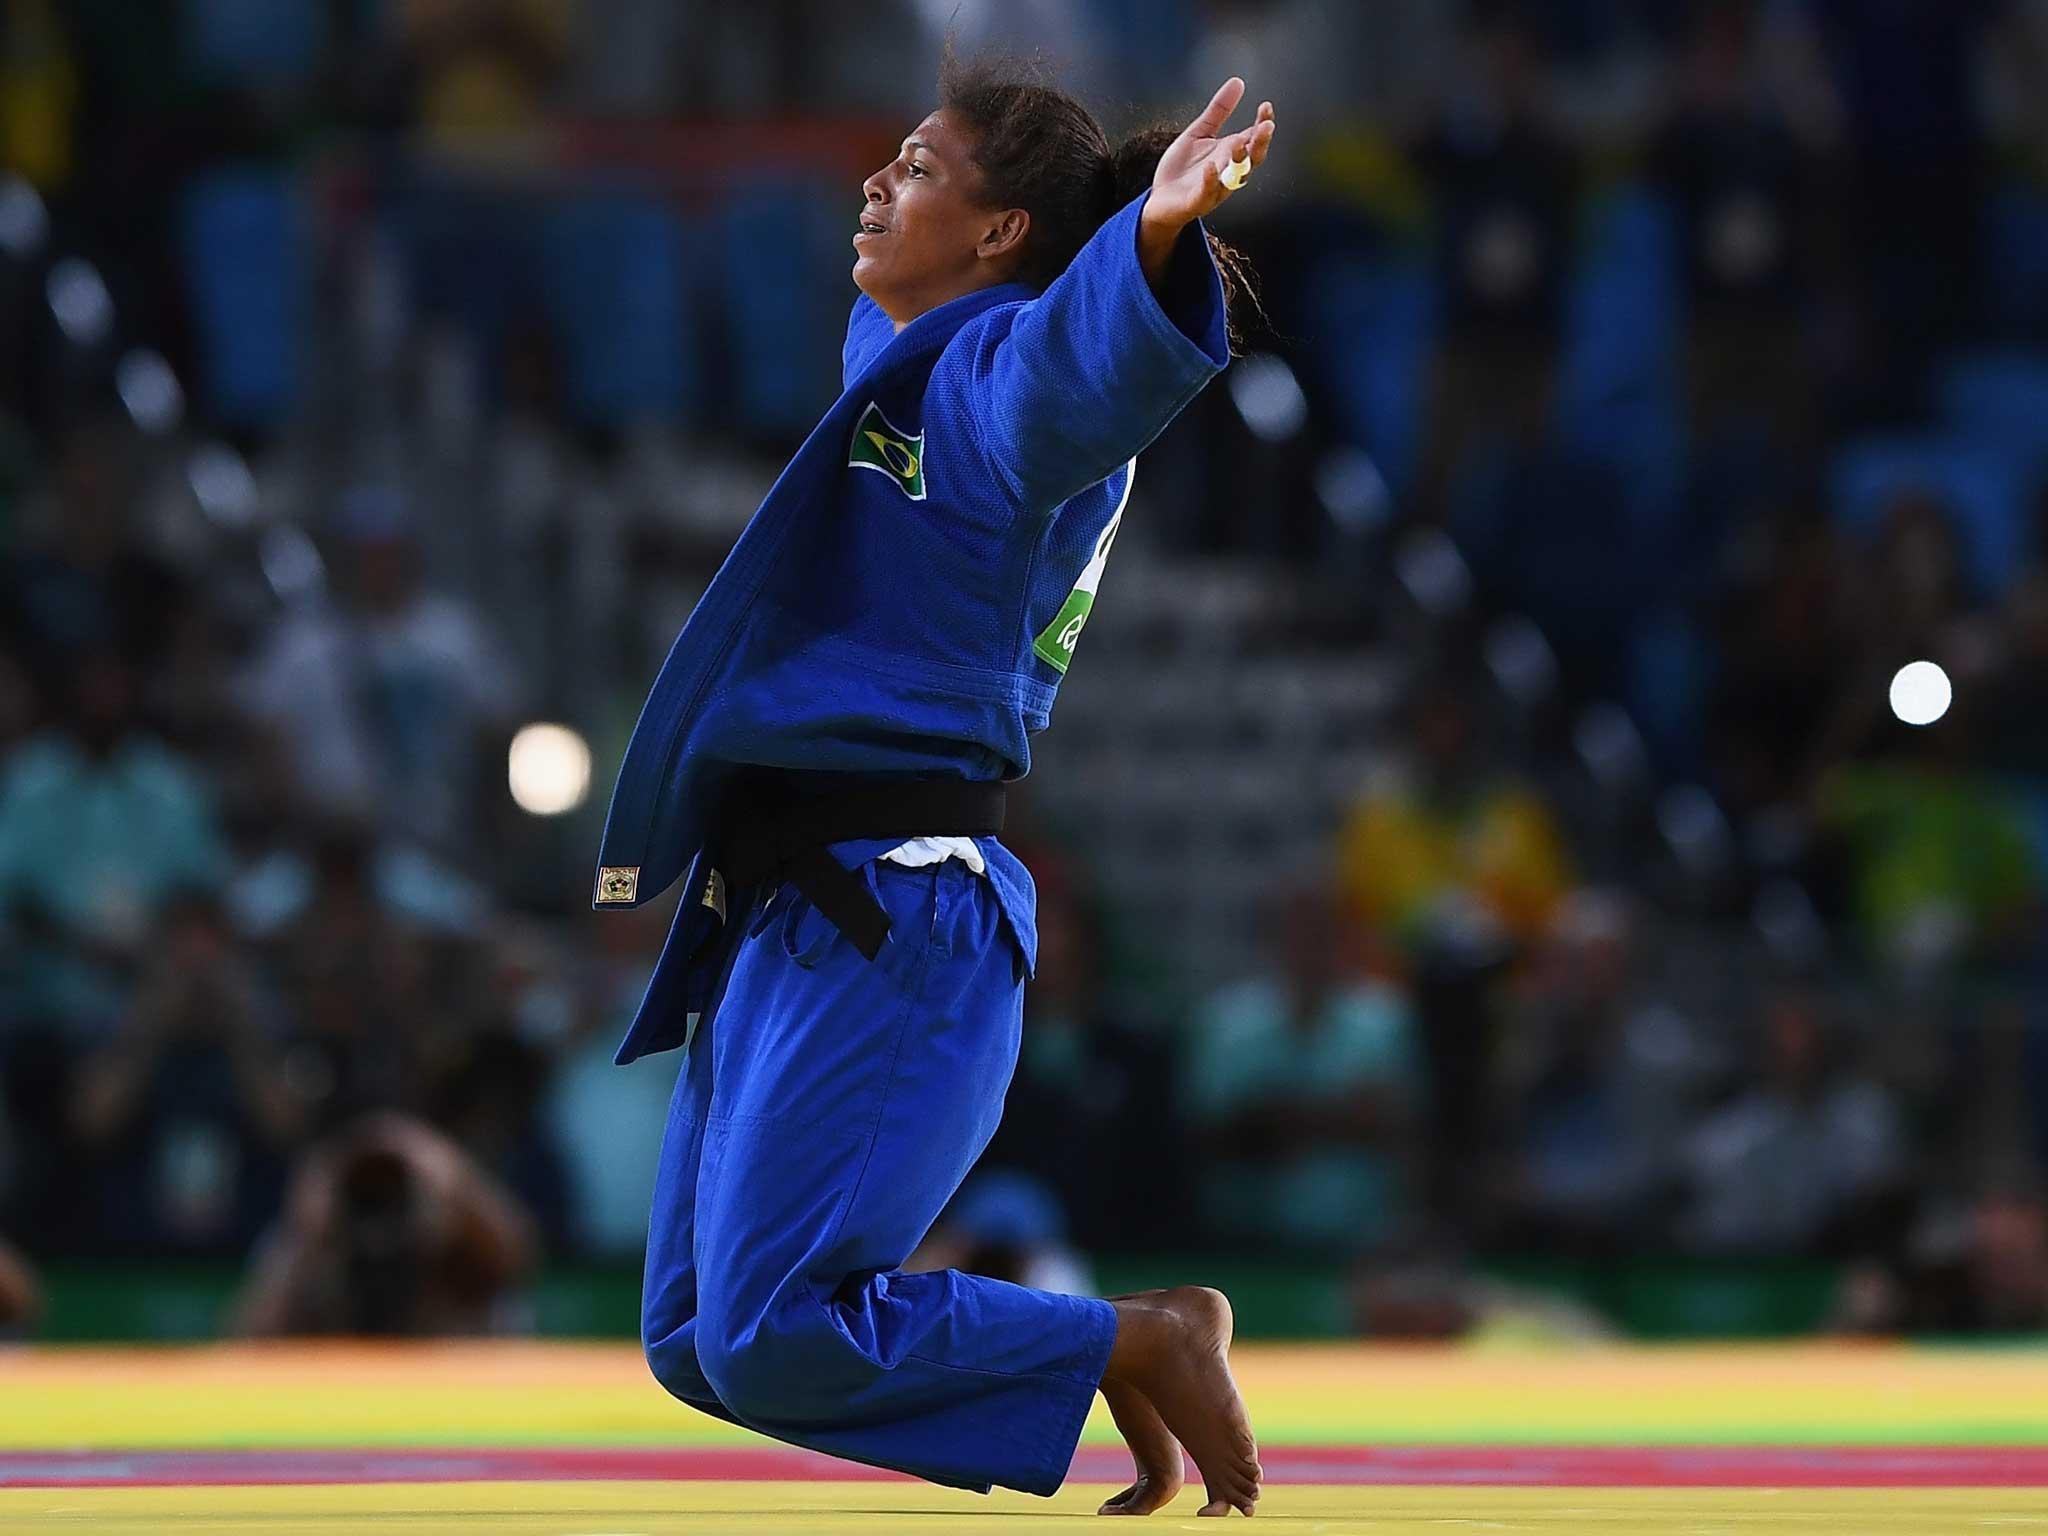 City of God turned gold medalist